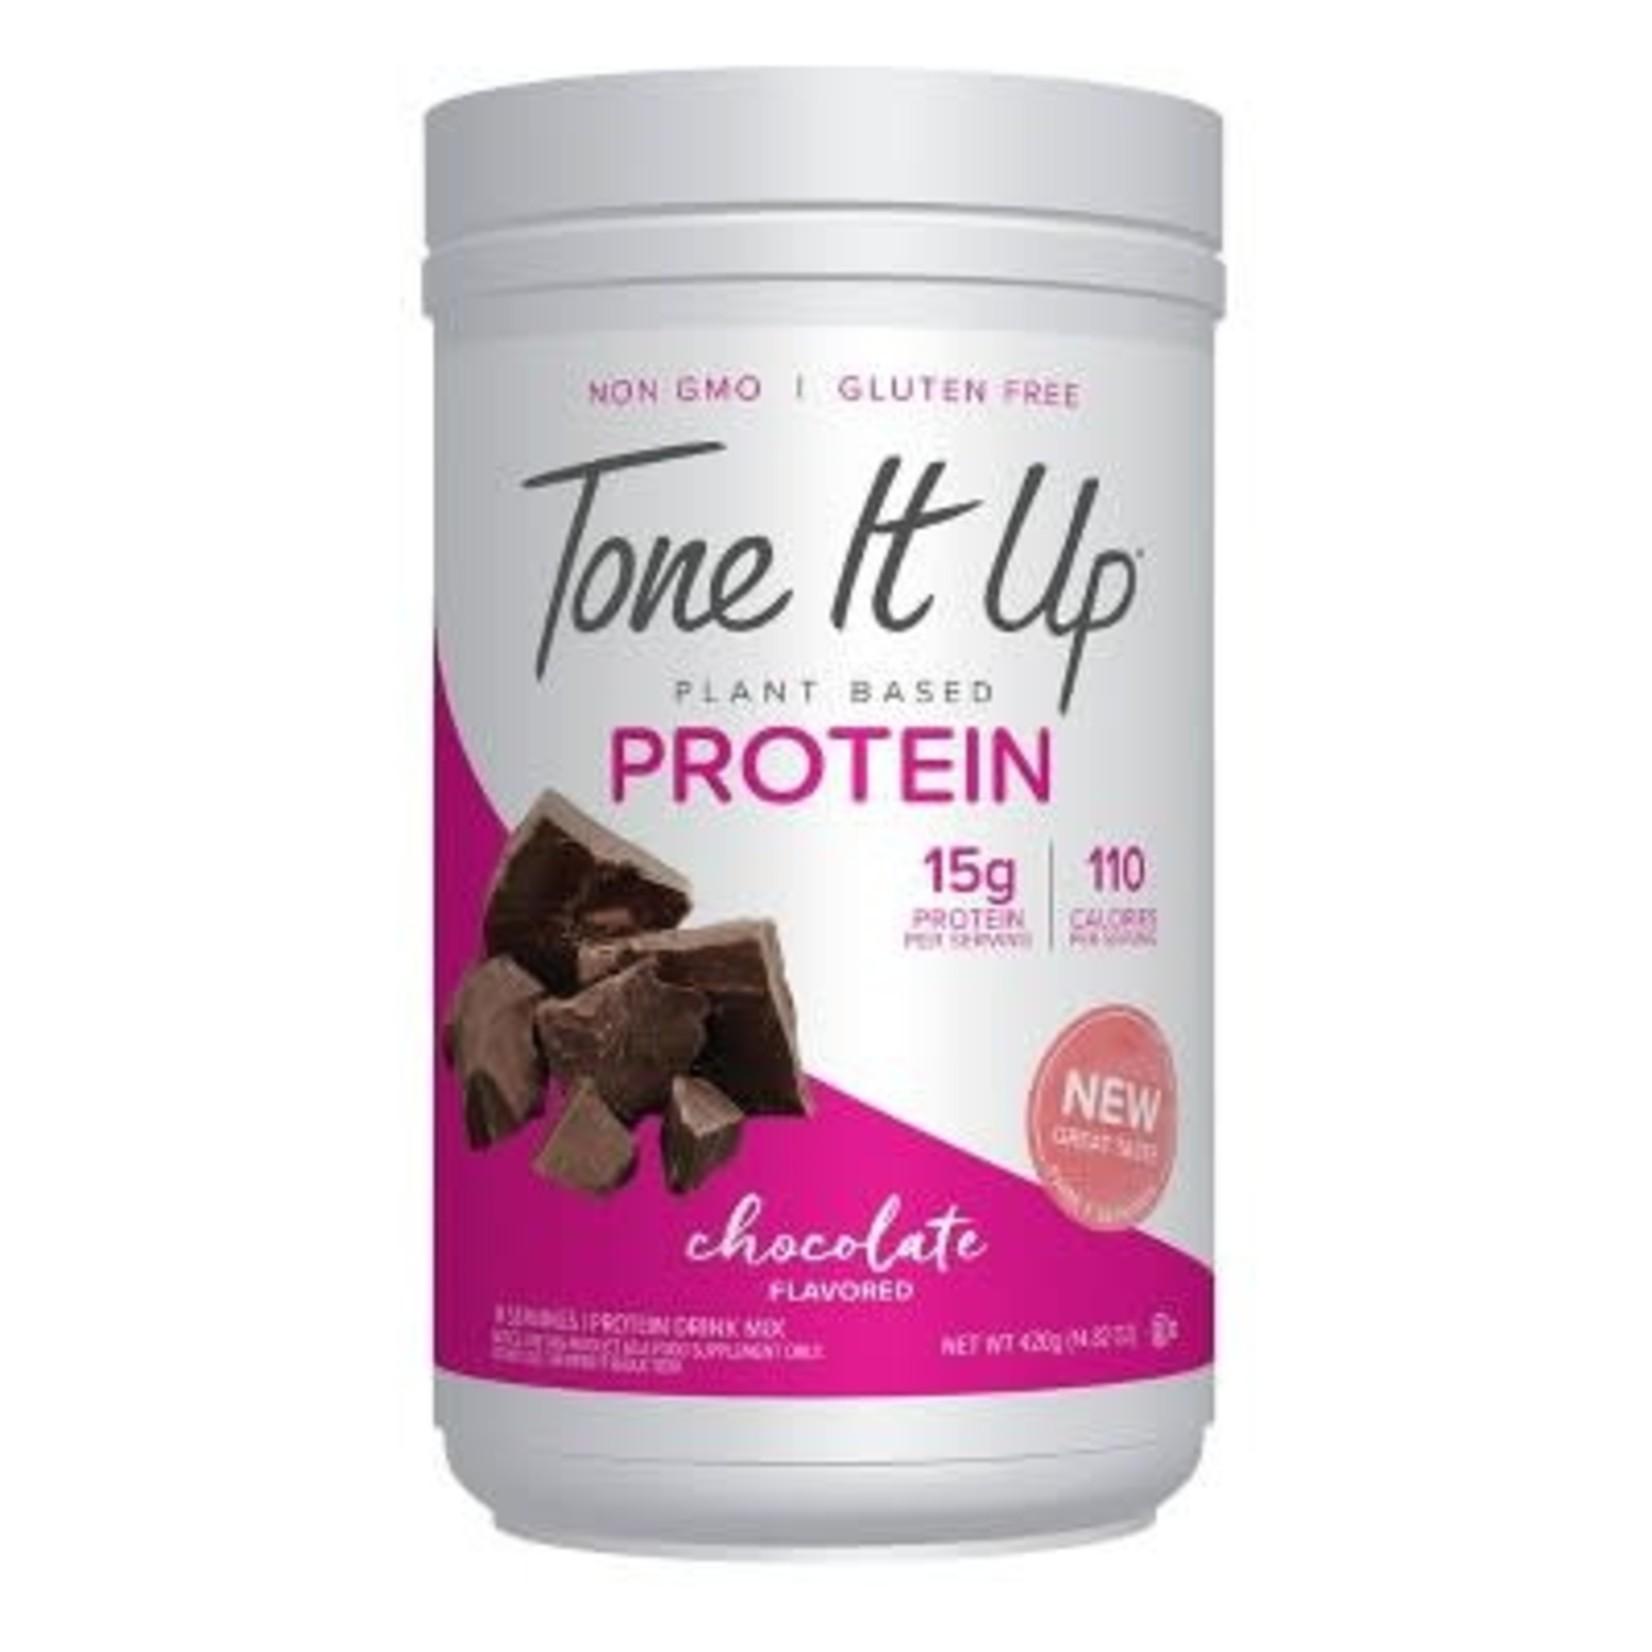 Tone It Up Plant Based Protein Powder - Chocolate - 14.82oz